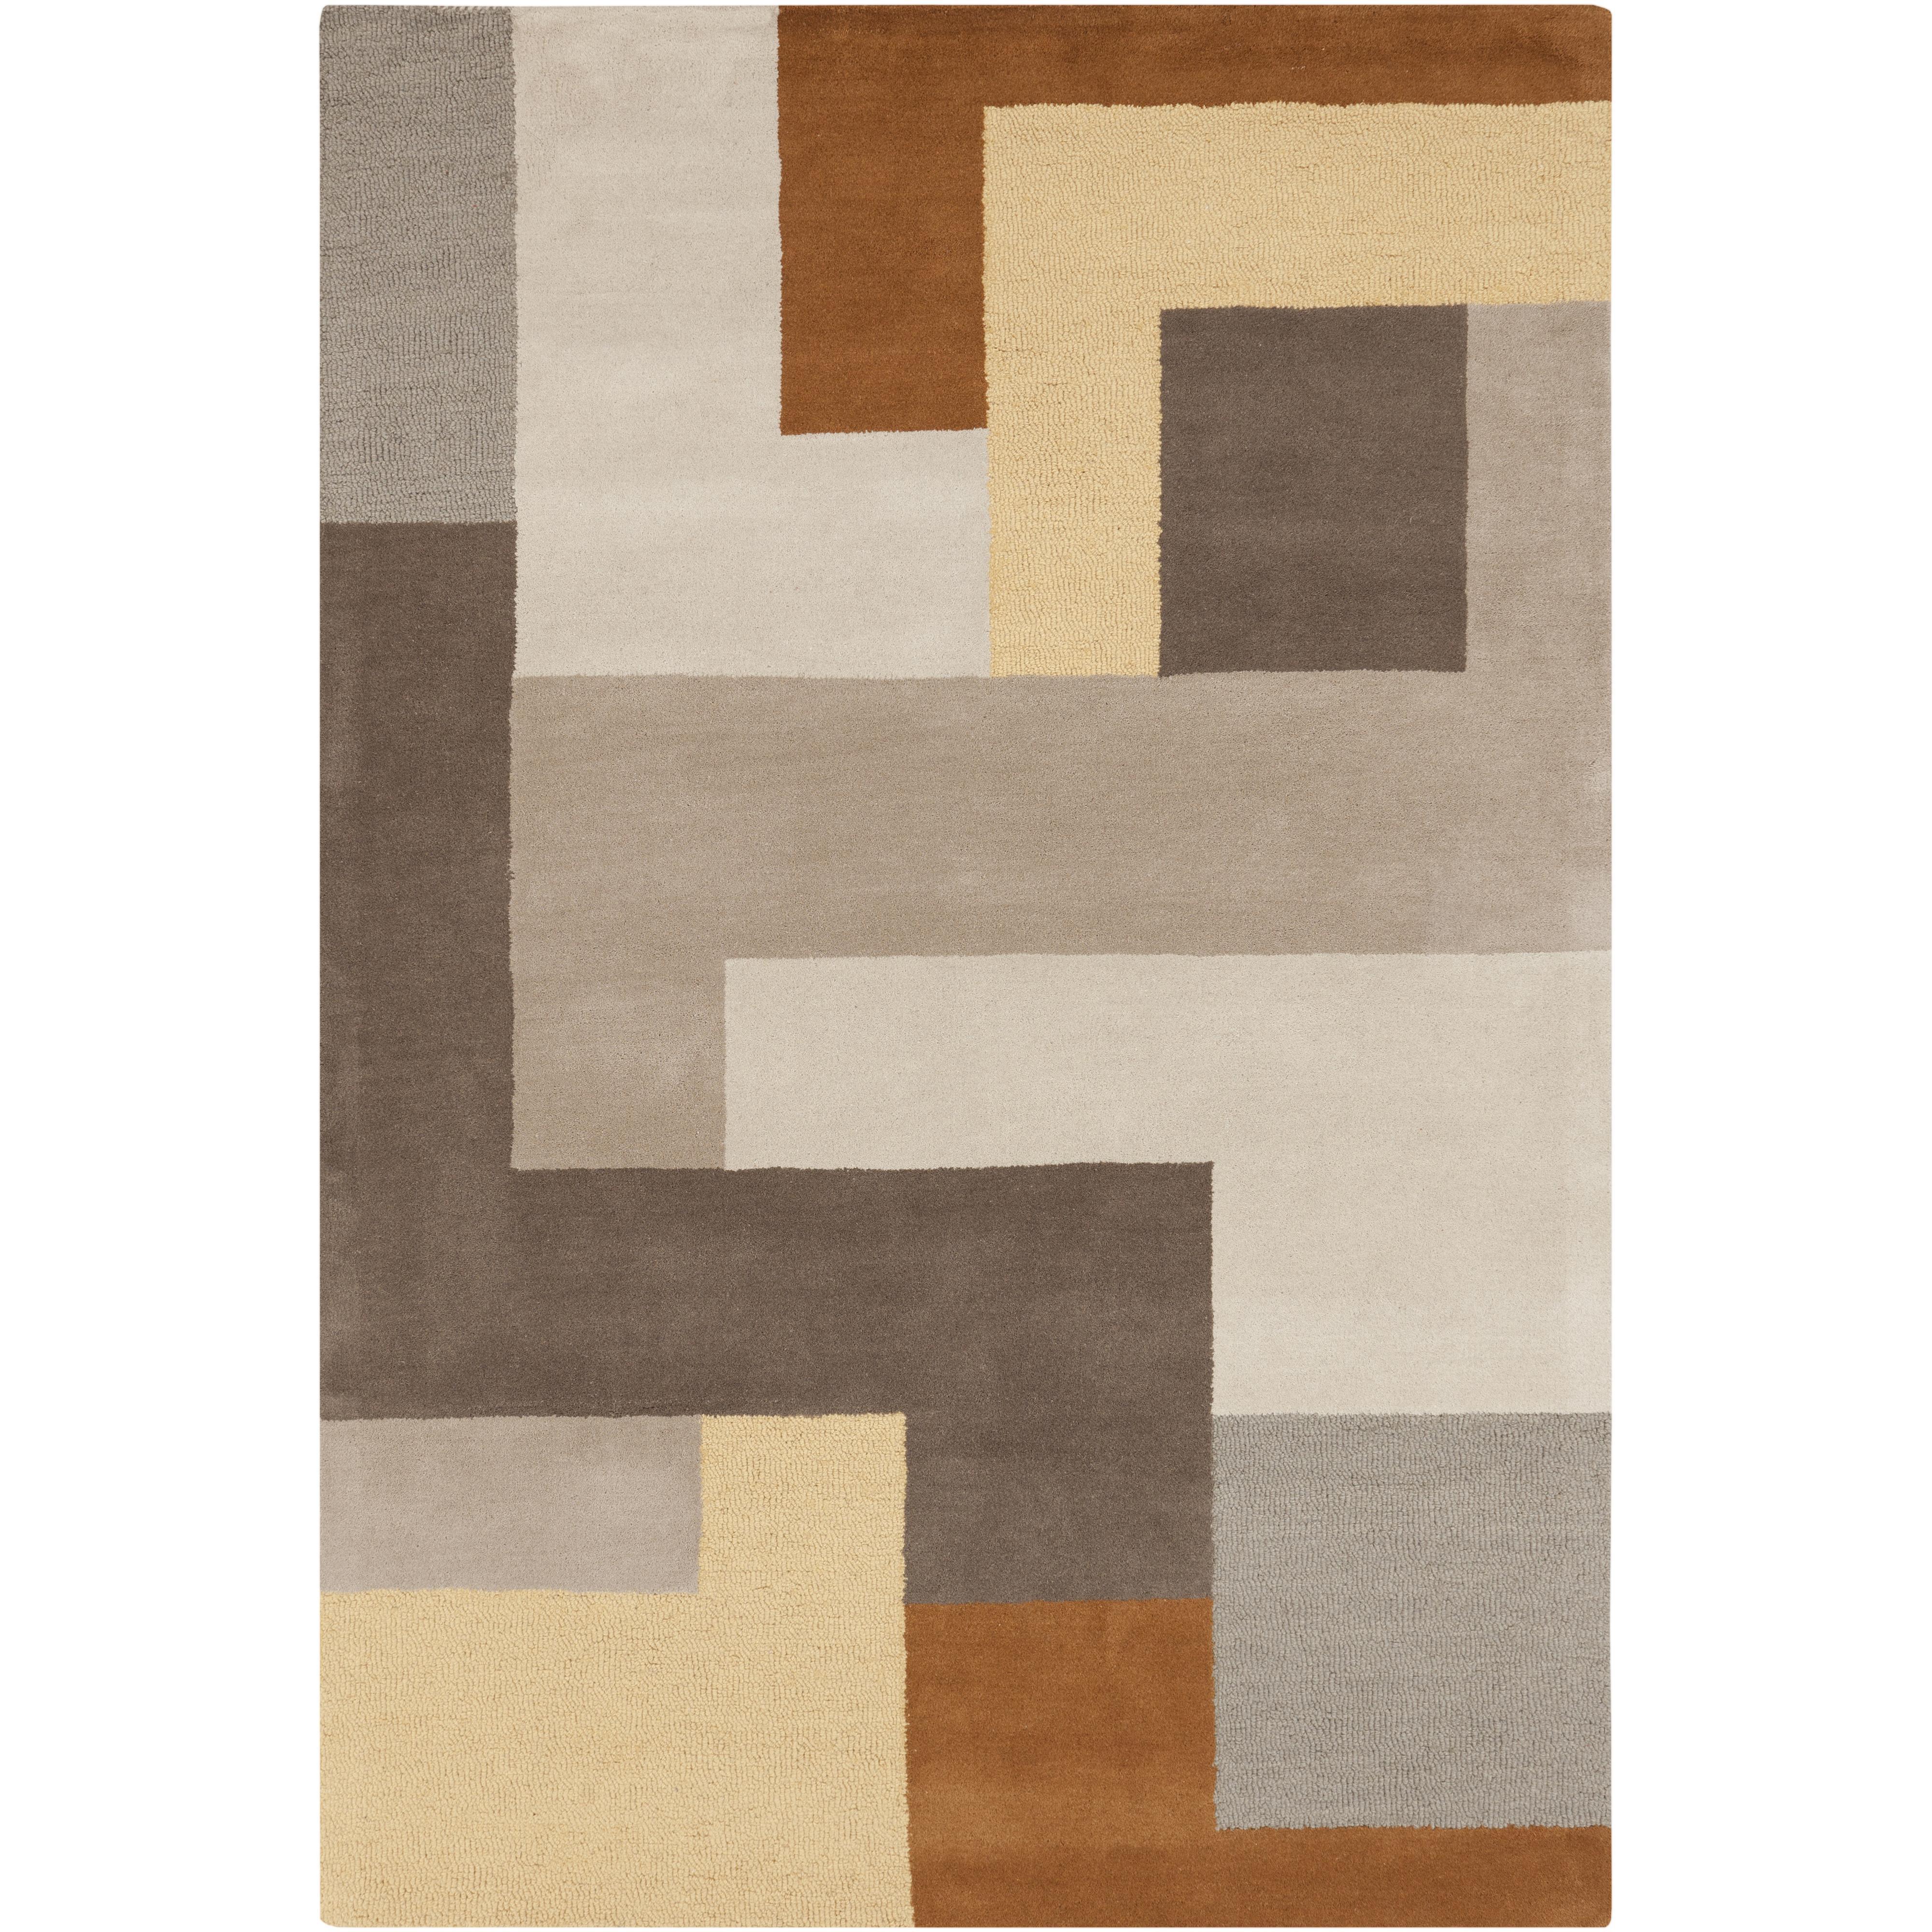 Surya Rugs Centennial 8' x 11' - Item Number: CNT1087-811